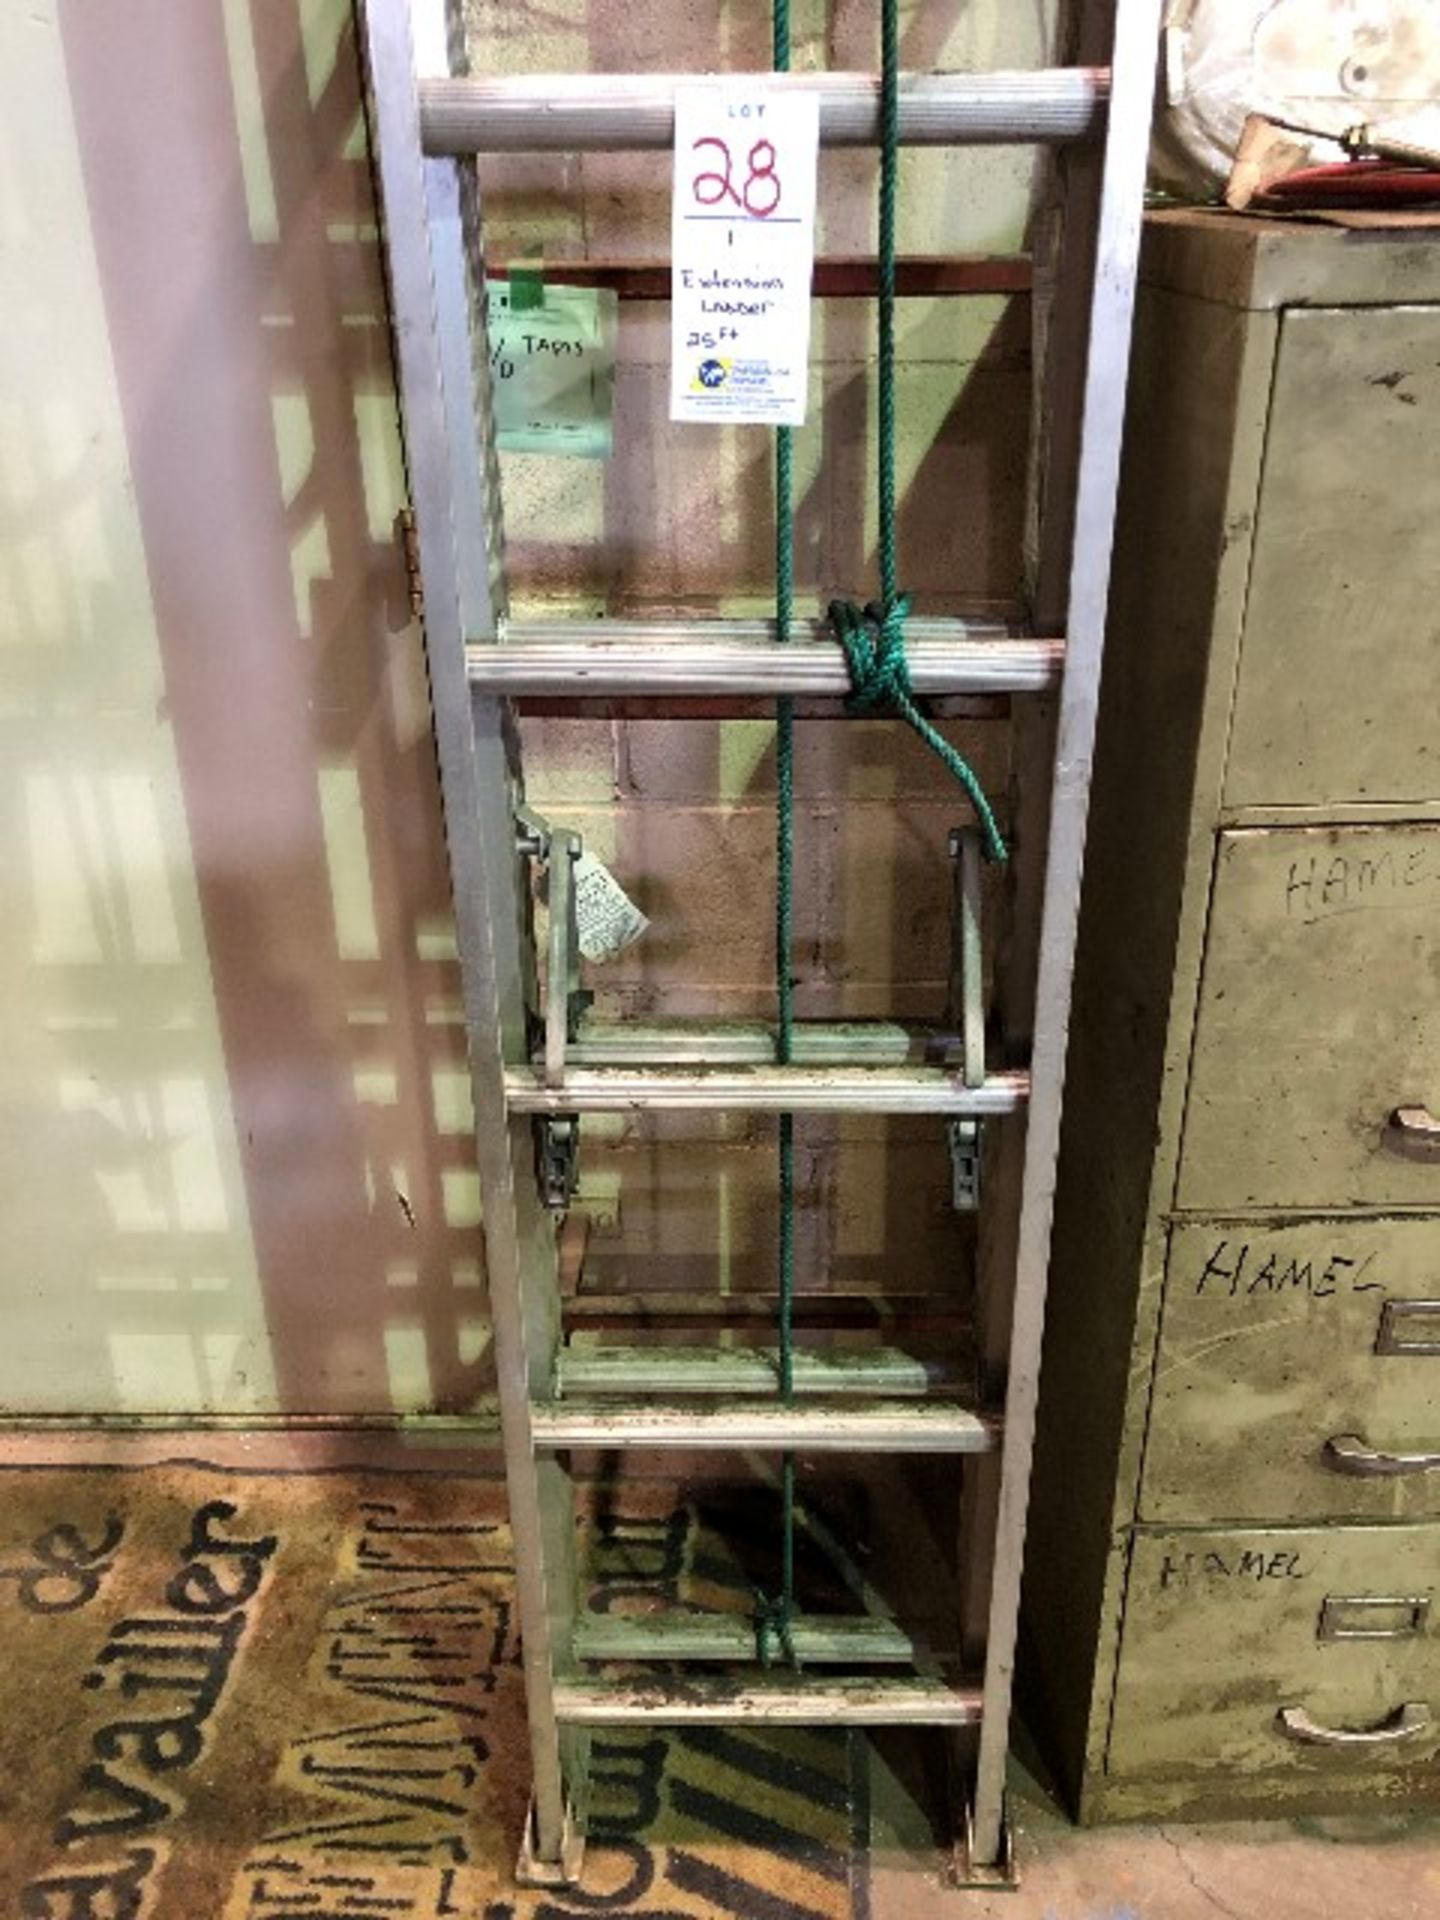 Extension ladder, 25ft - Image 2 of 3